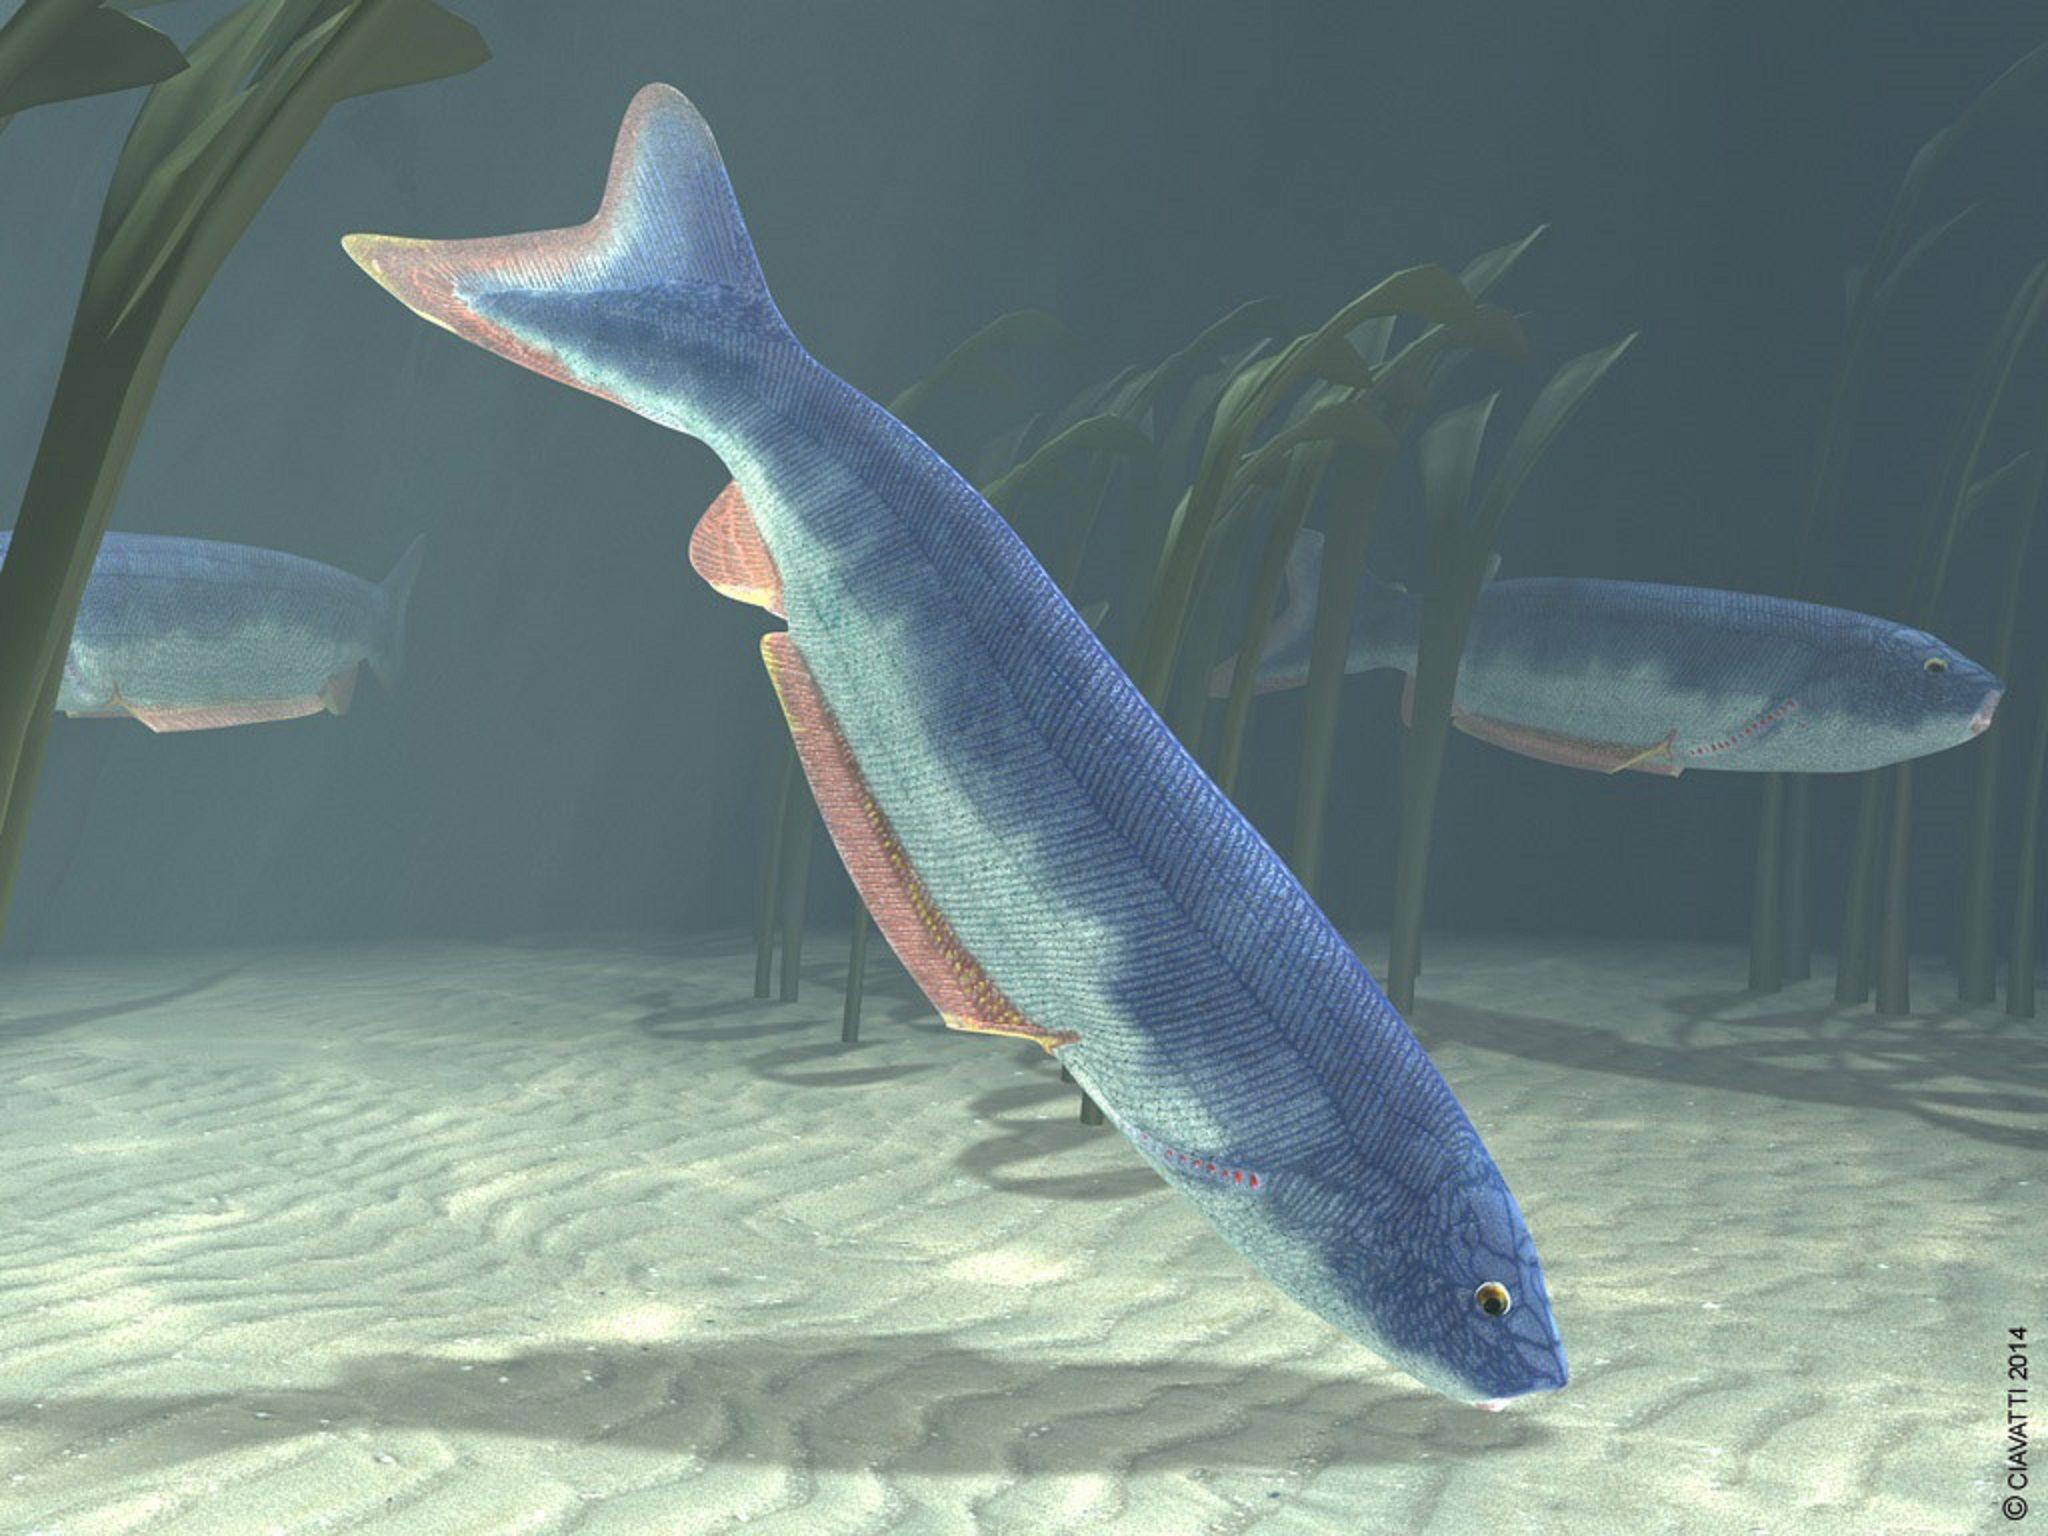 Ordovician period jawless fish